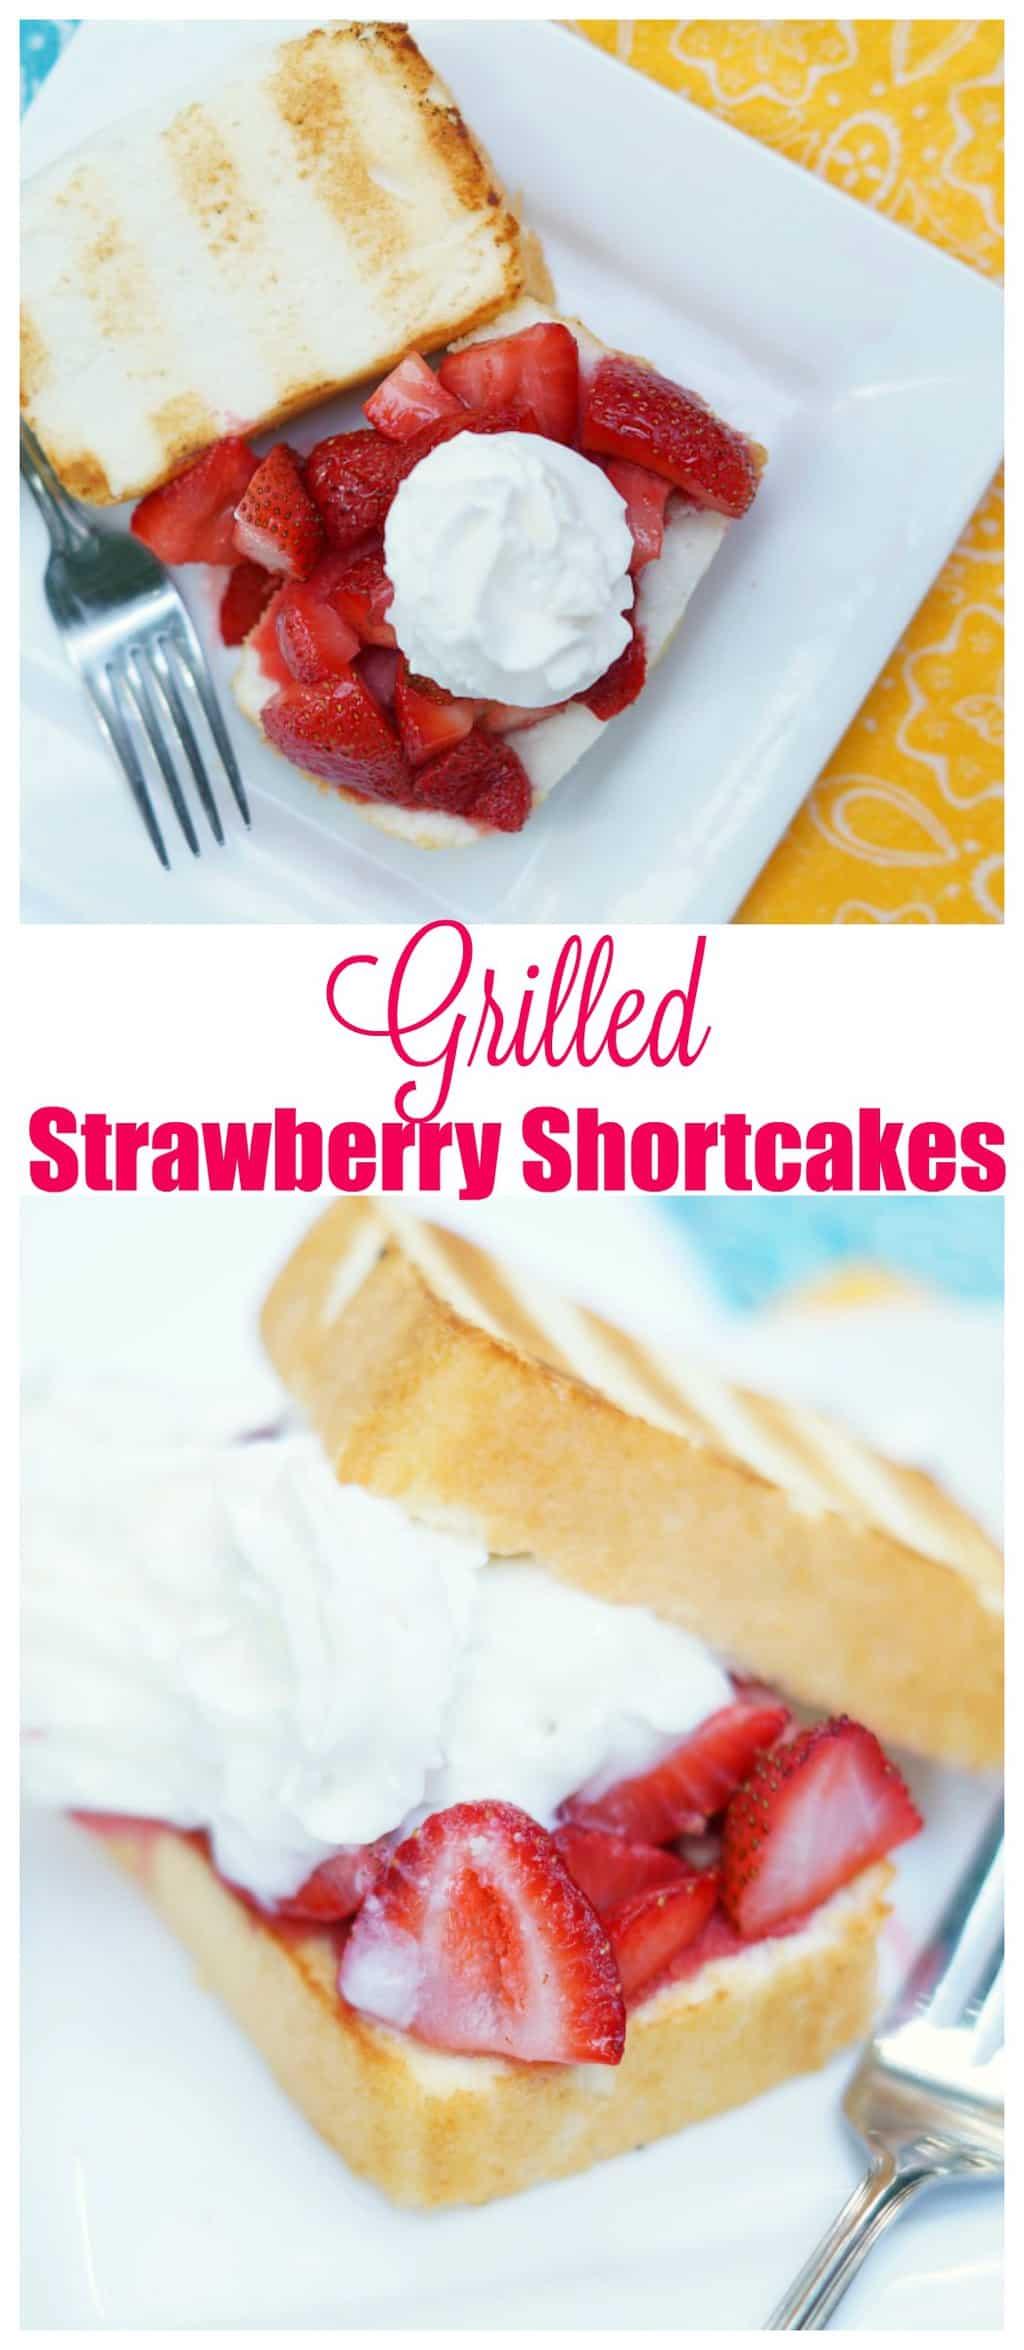 grilledstrawberryshortcakes